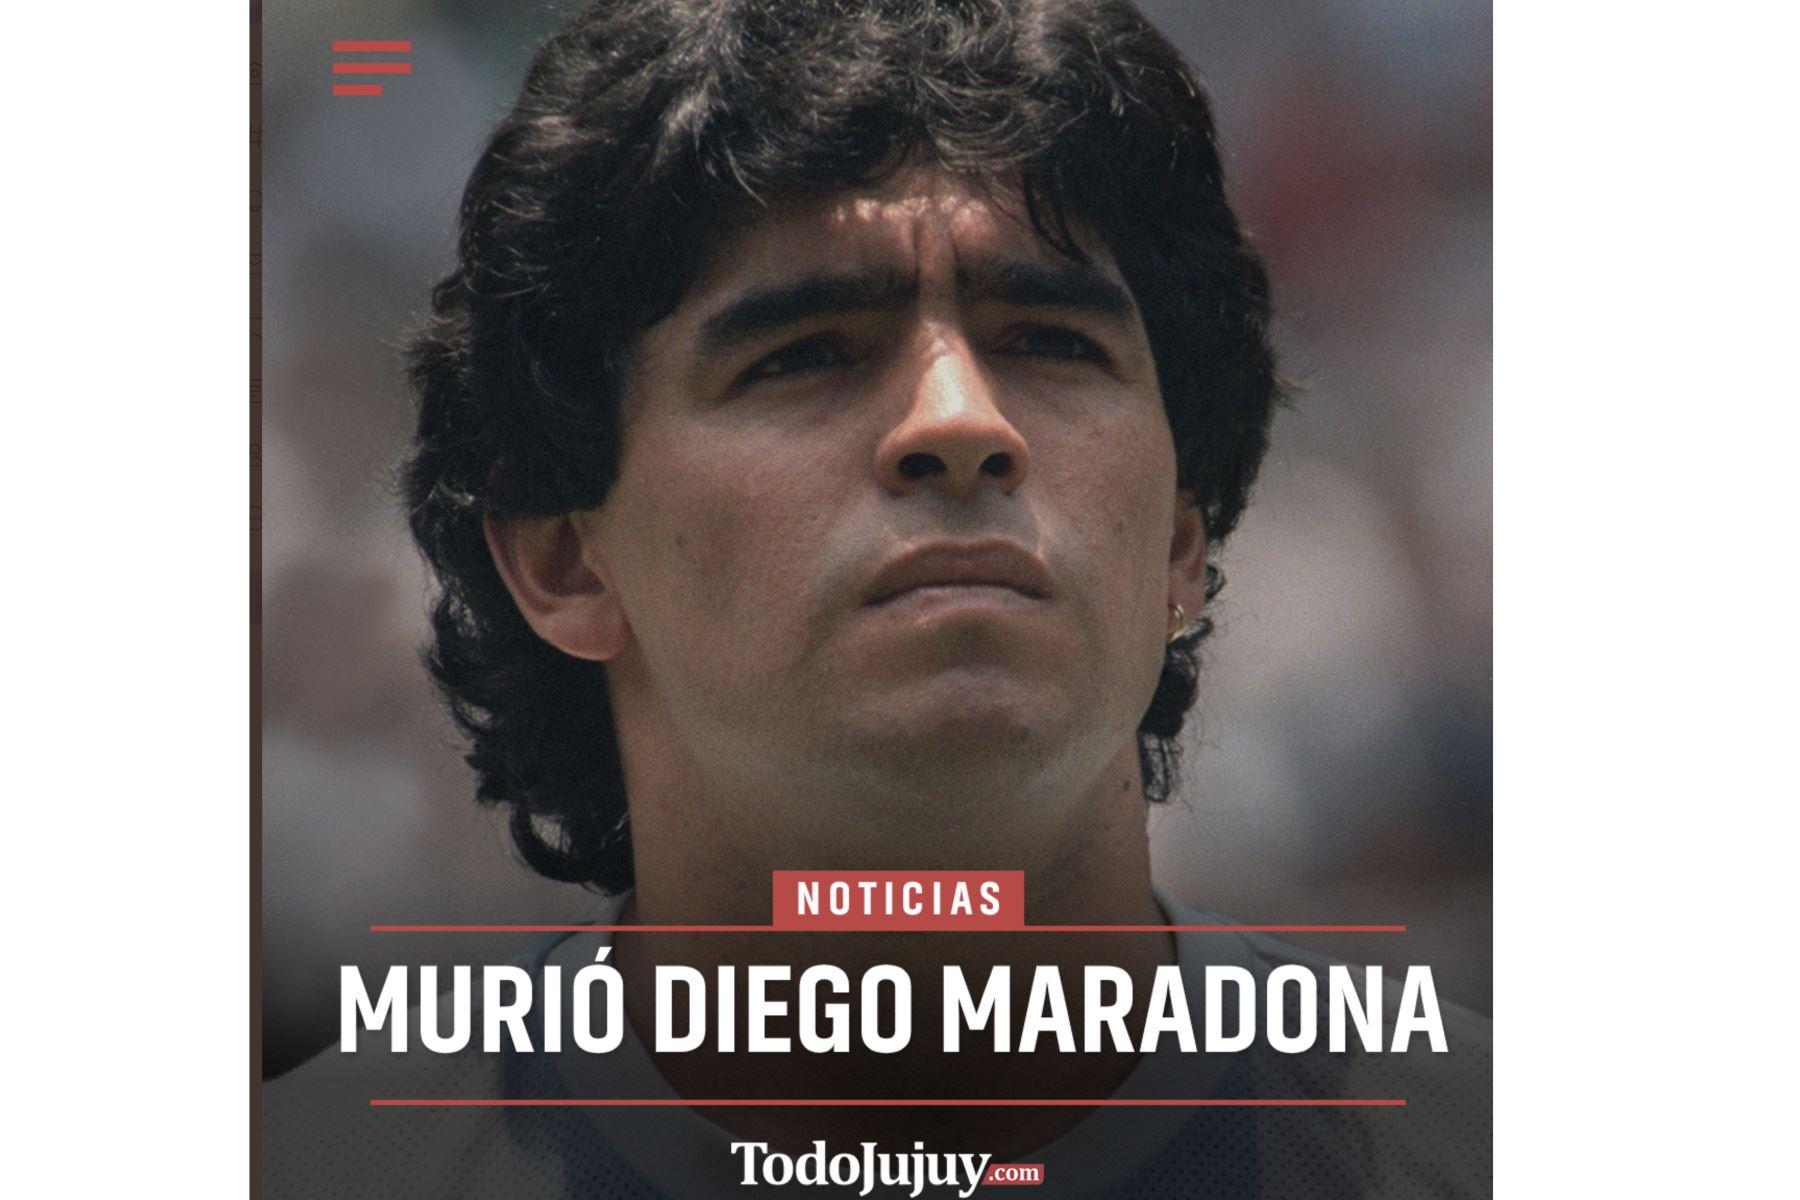 Así informa la prensa mundial la muerte de Diego Armando Maradona. Todo Jujuy